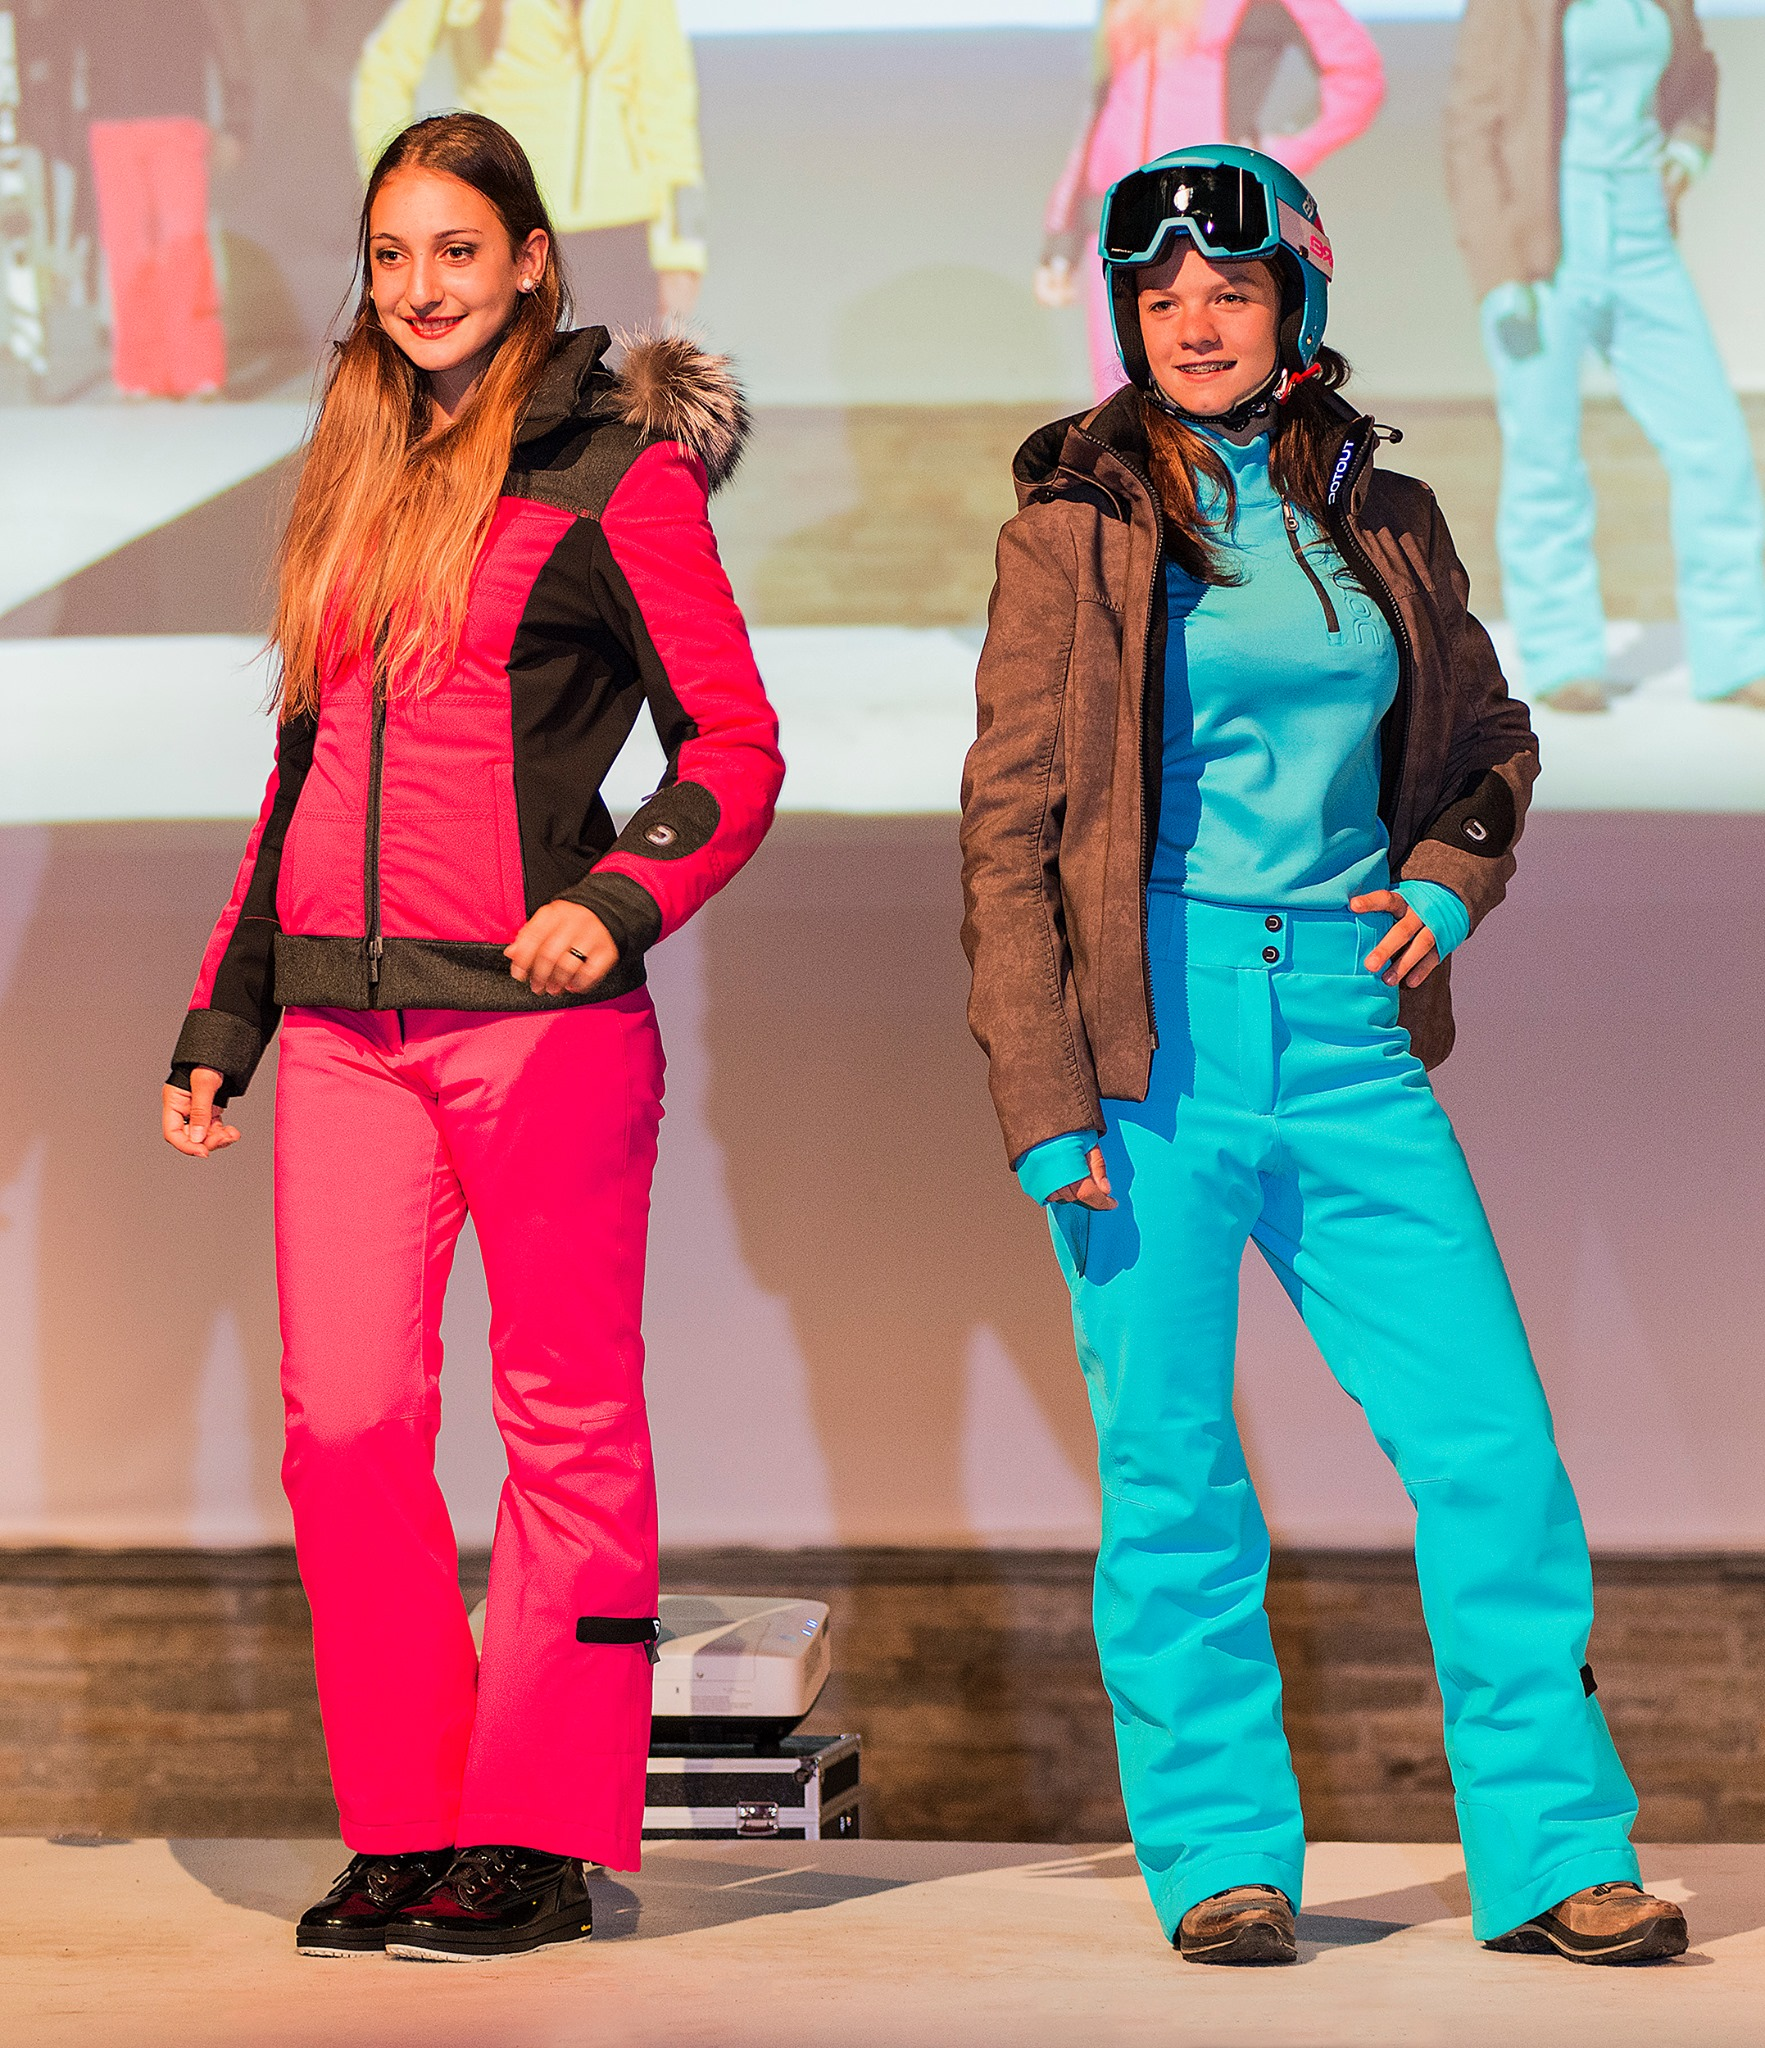 sfilata botteroski vernante 2016 sci inverno 2017